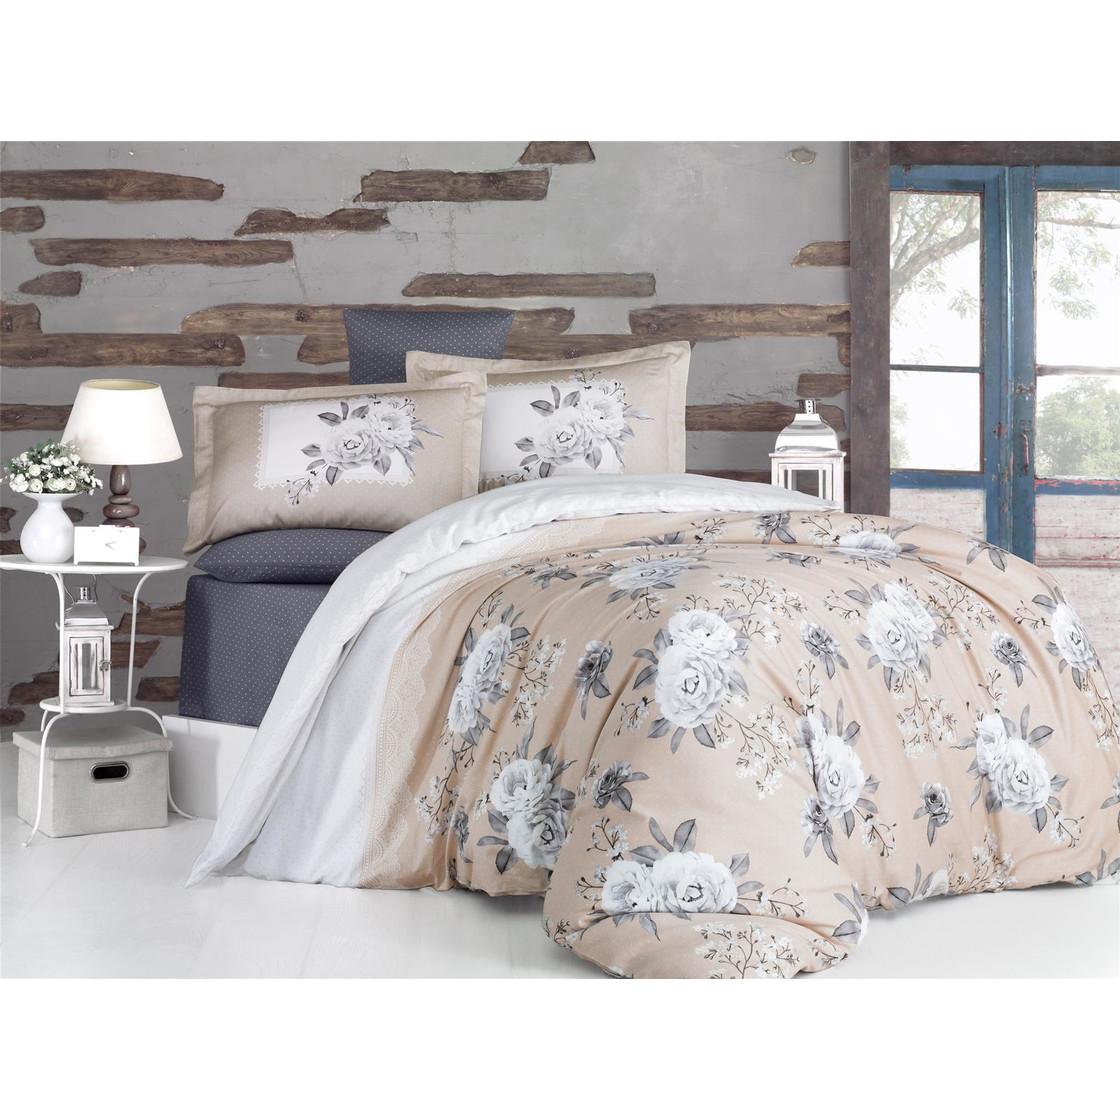 satin bettw sche 200x220 cm 2 x kissenbezug 80x80 cm kenzo v1 5tlg 36 90. Black Bedroom Furniture Sets. Home Design Ideas